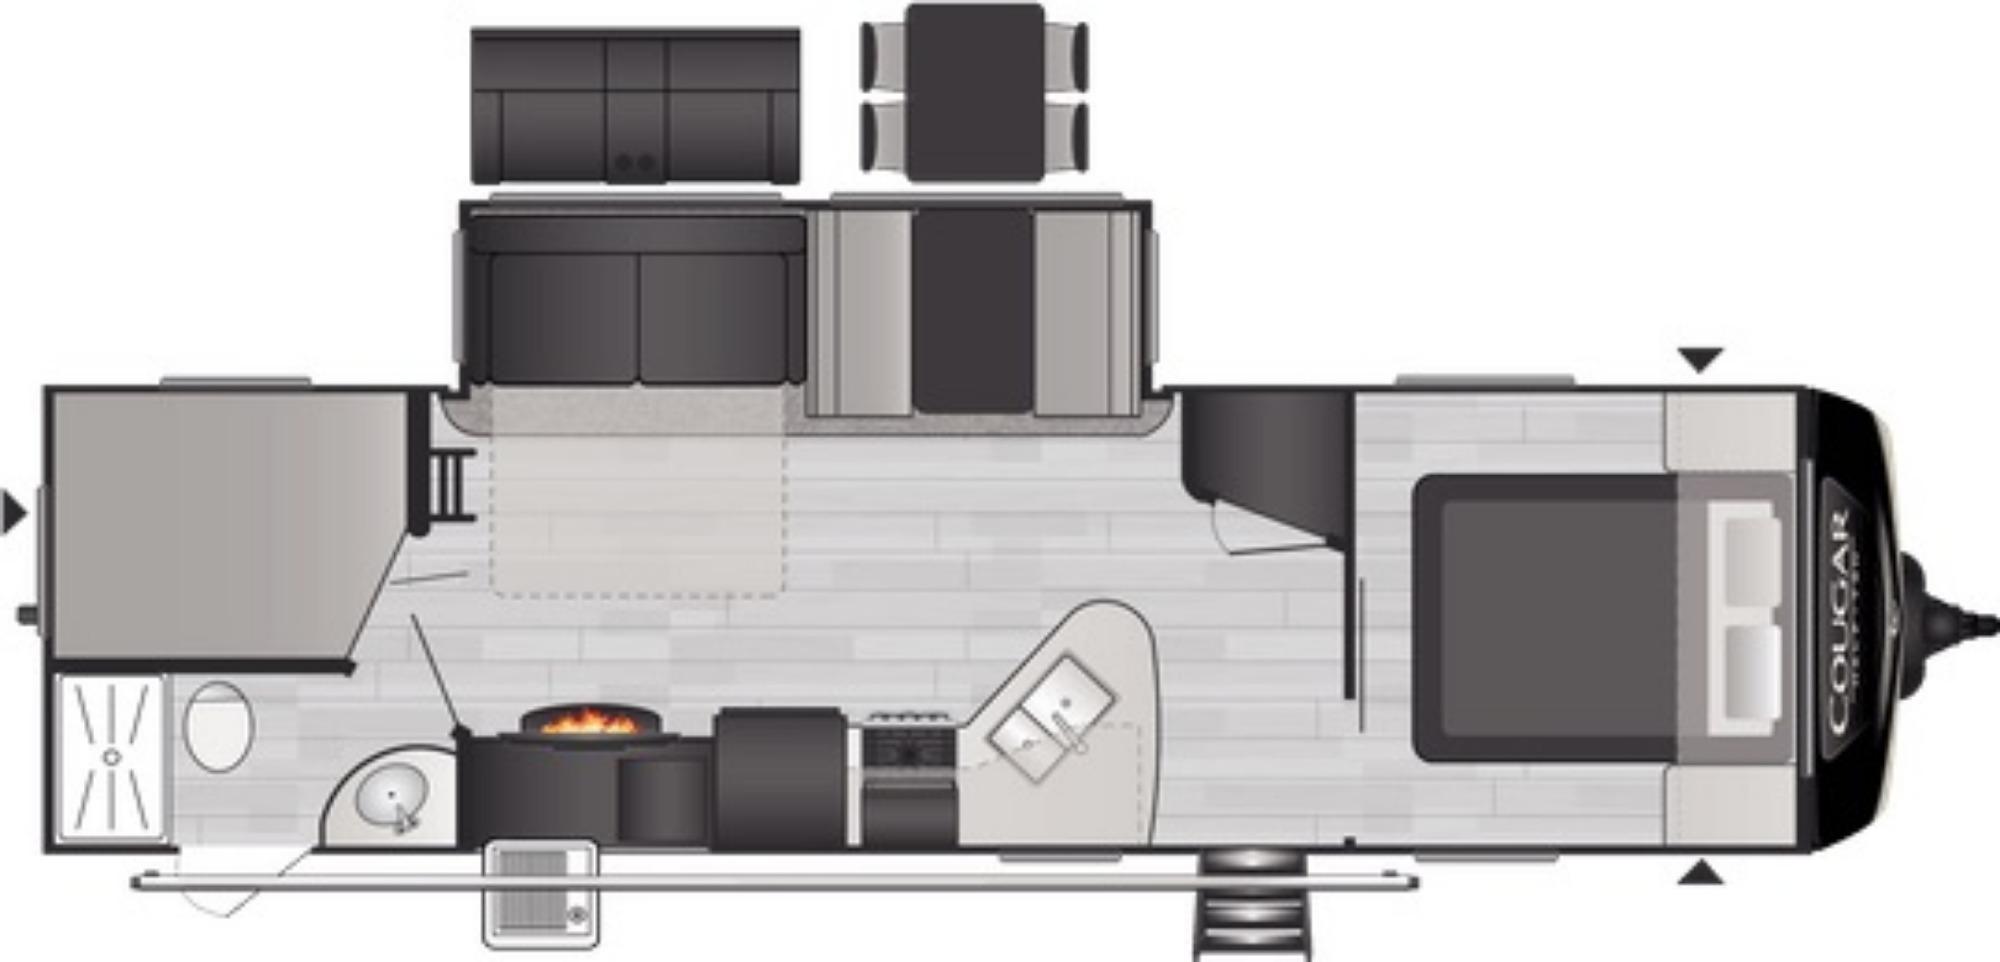 View Floor Plan for 2021 KEYSTONE COUGAR 29BHSWE